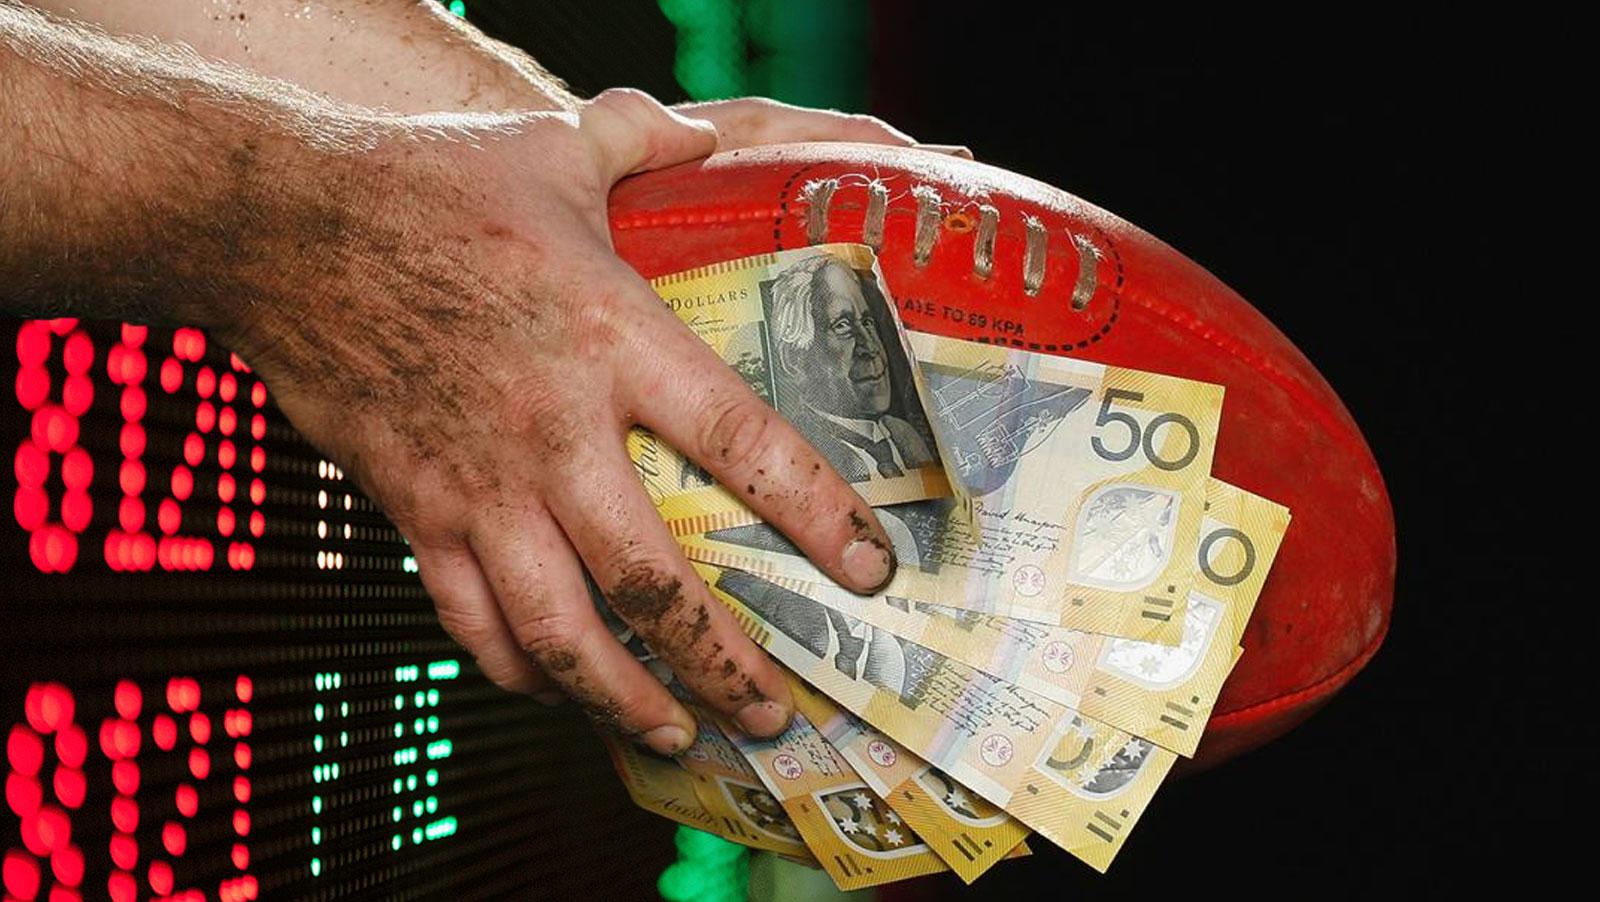 Aussie radios mull muting gambling ads during live sports